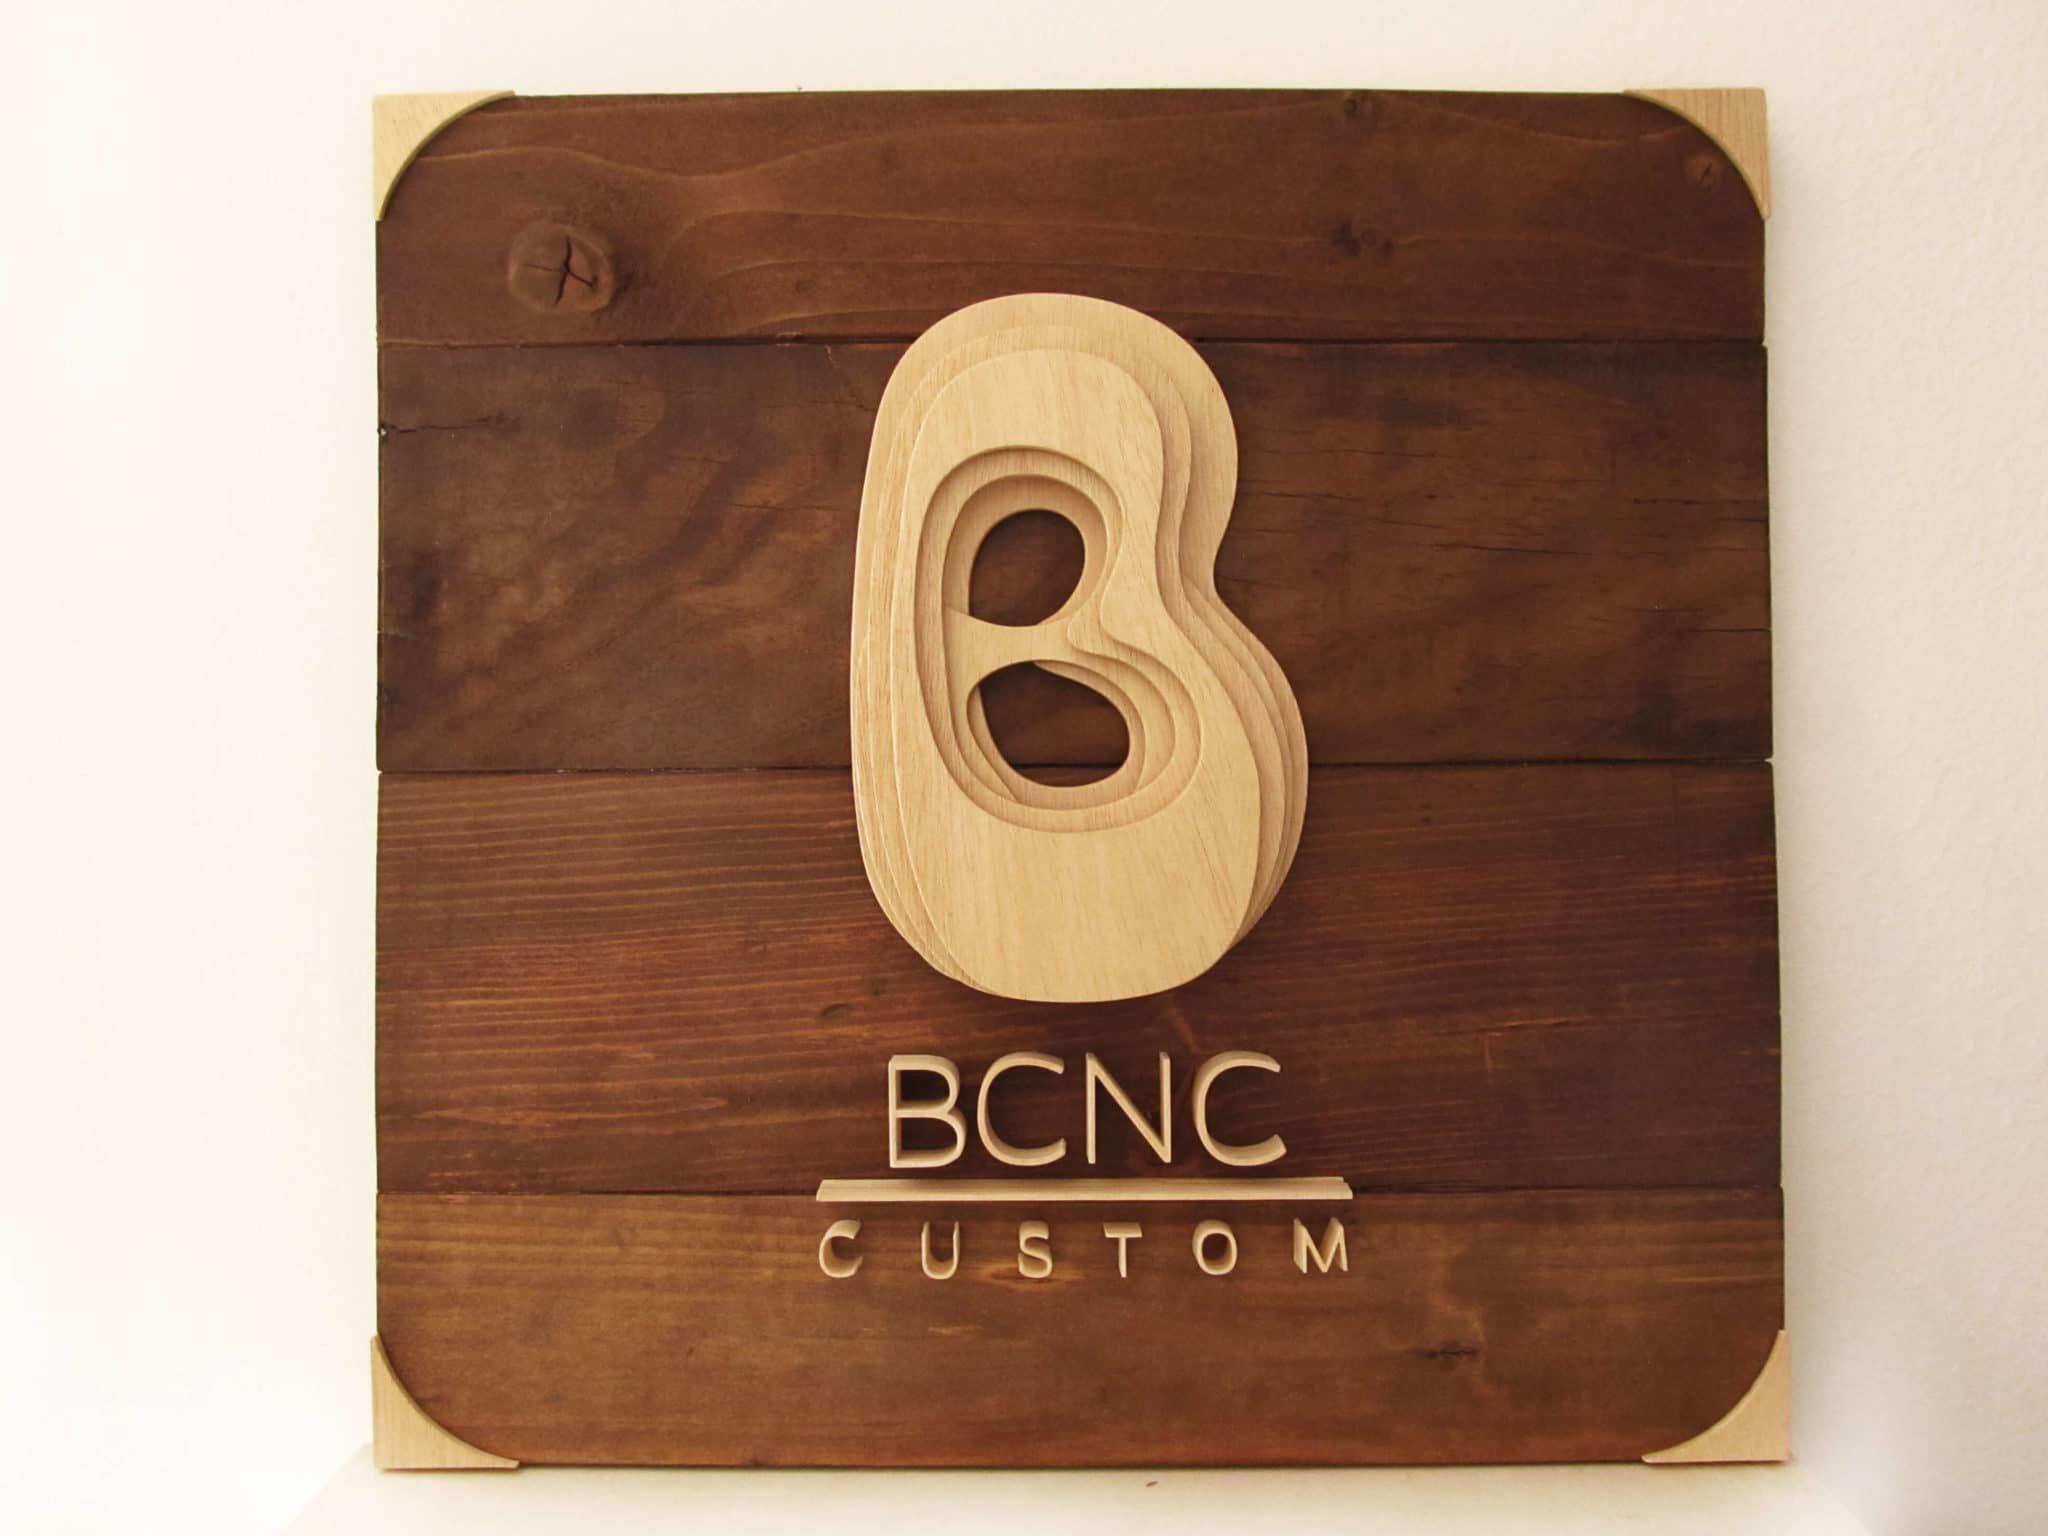 BCNC Custom